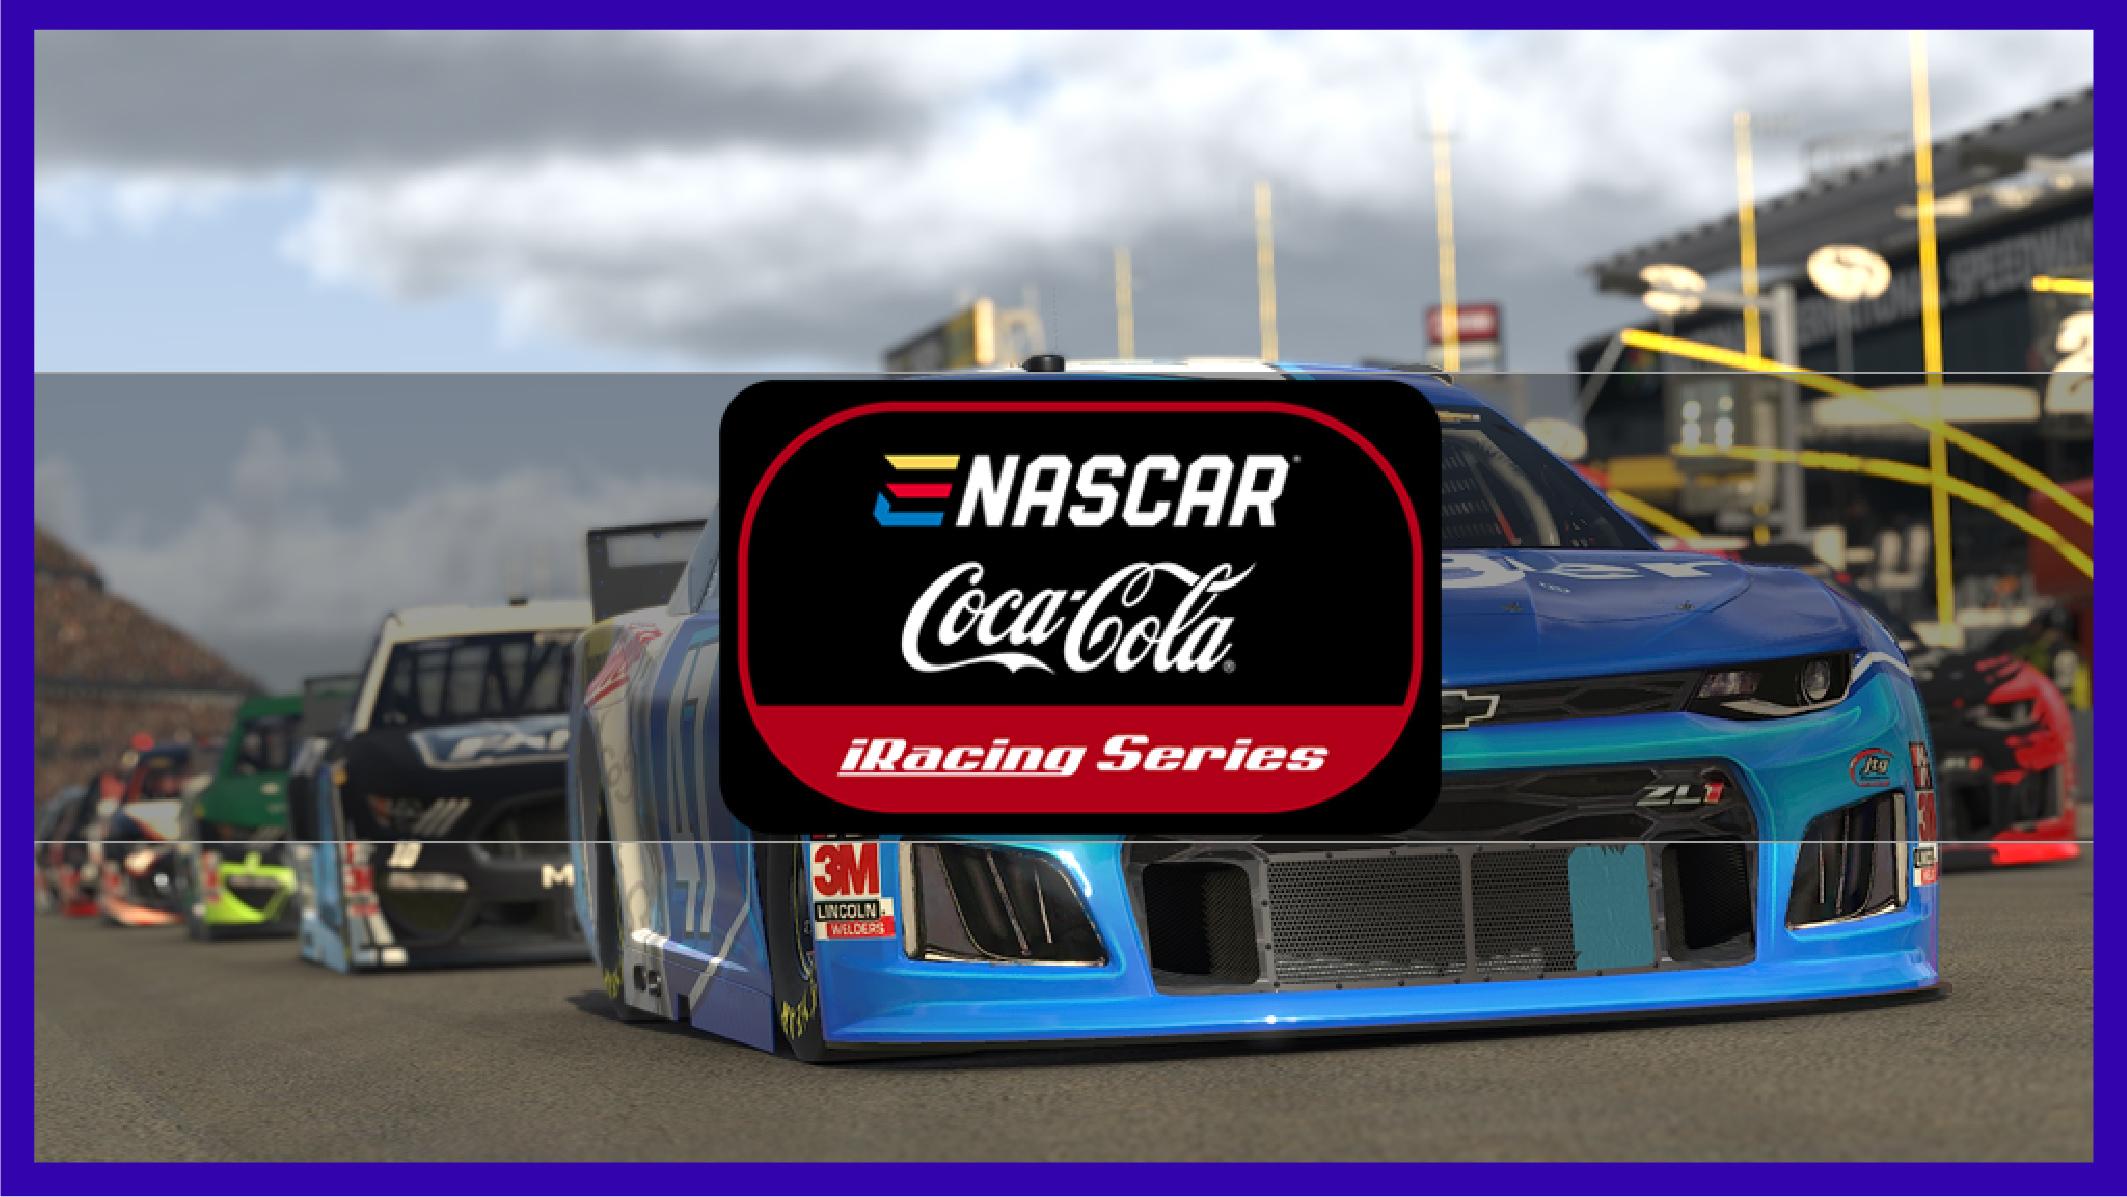 Coca cola sponsored Nascar Iracing series